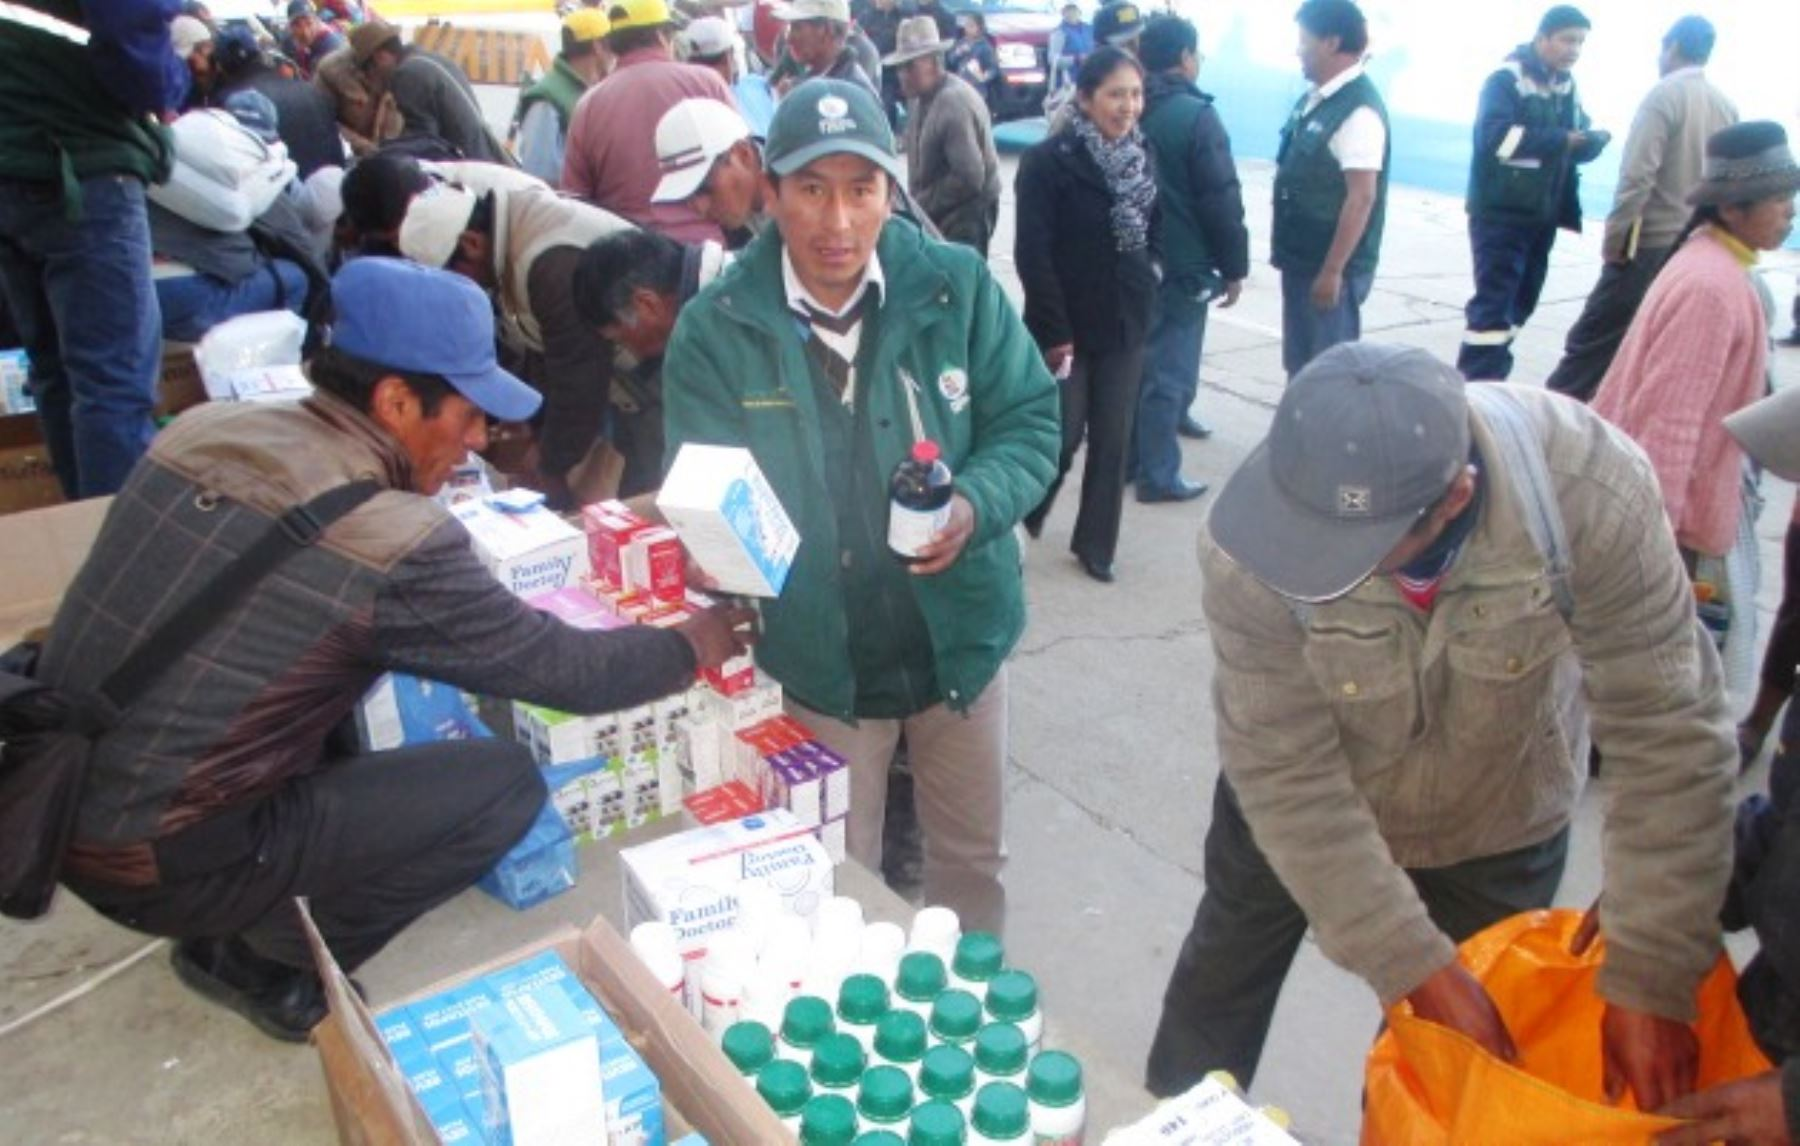 Ganaderos de Junín reciben kits veterinarios para enfrentar heladas. ANDINA